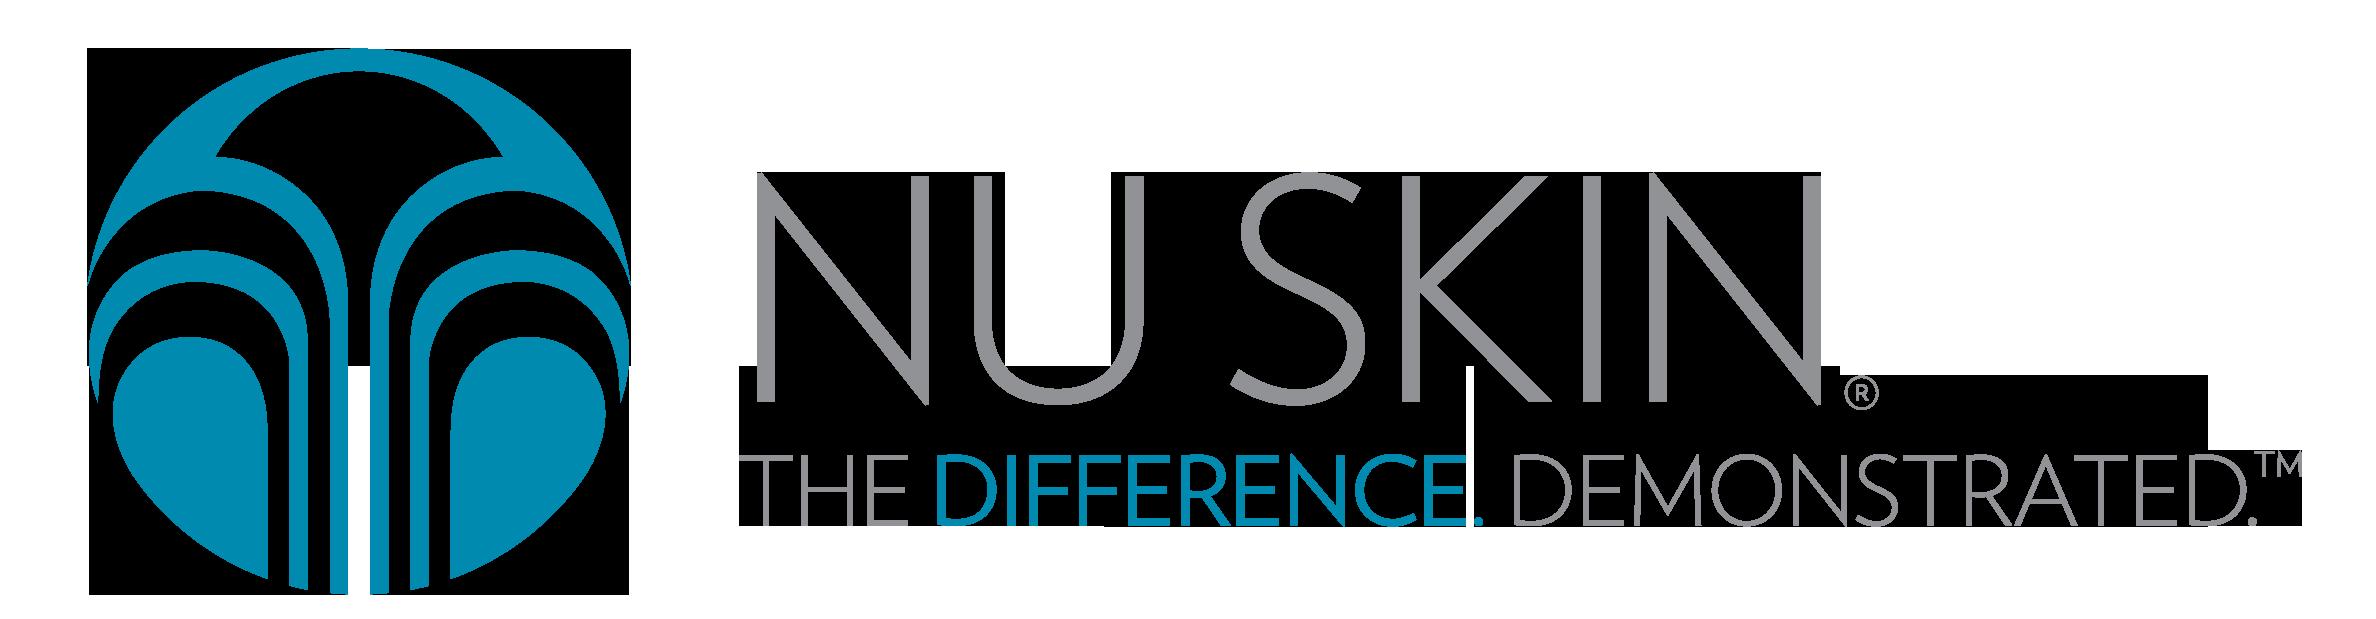 nuskin-hrzntl-reg-cntr-logo_CSHiRes.png